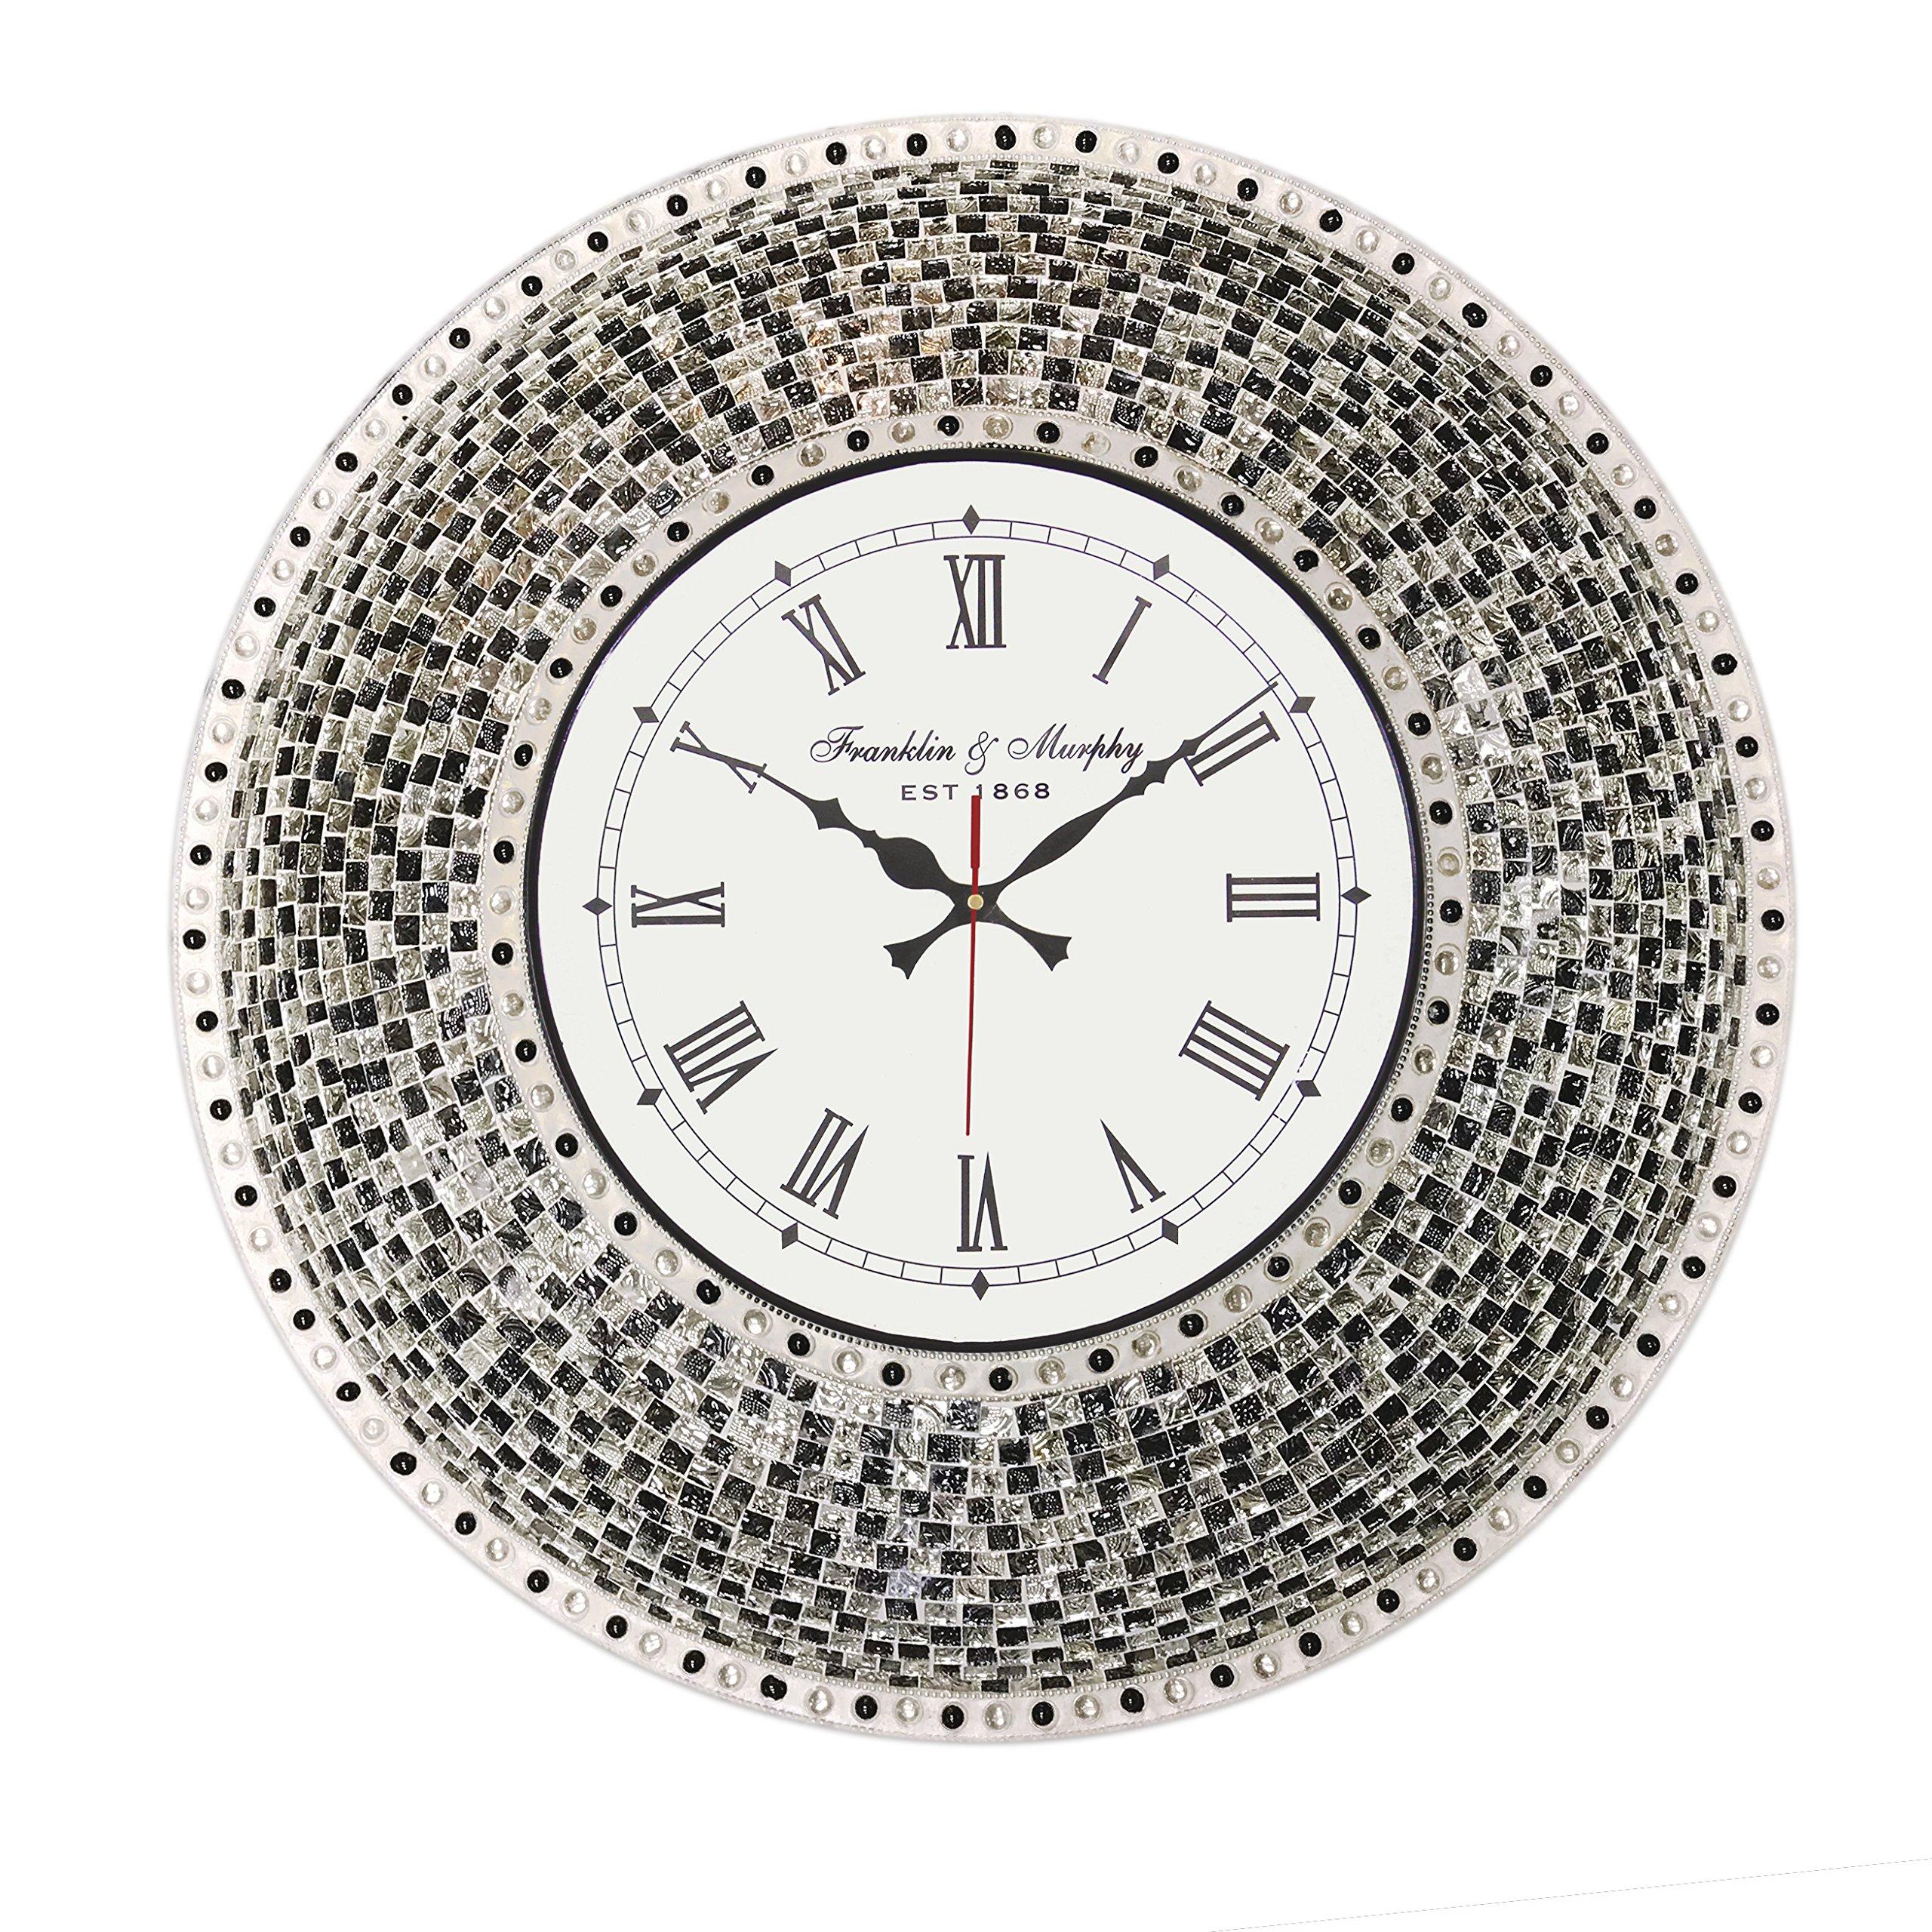 22.5'' Black, Handmade Glass Mosaic Wall Clock, Quiet Motion Design by DecorShore